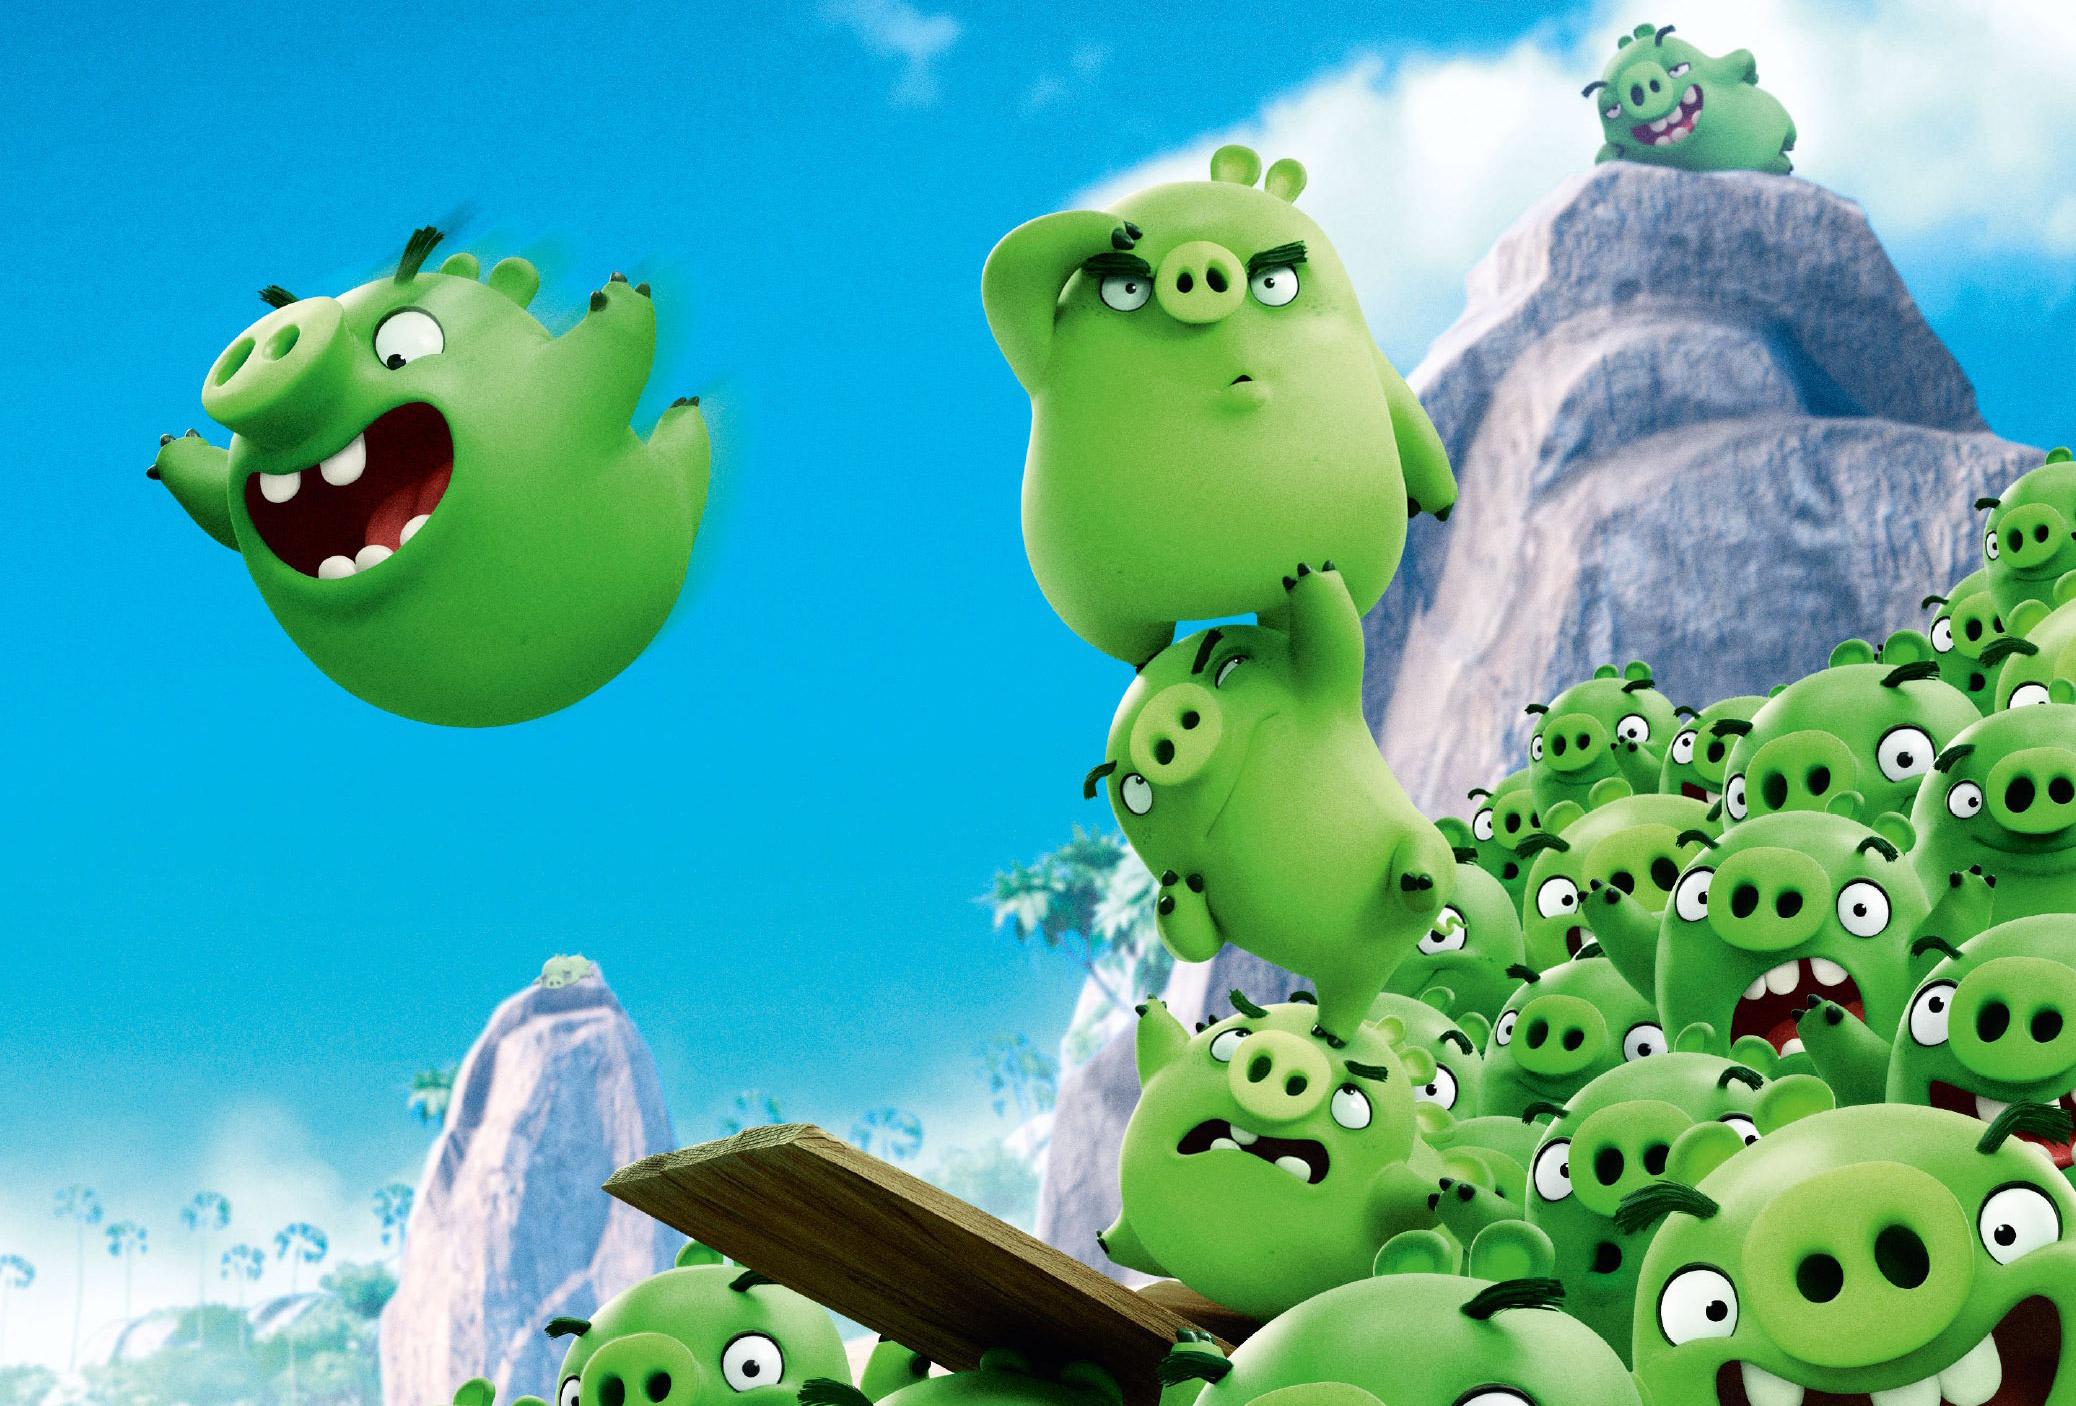 Cute Piggies Wallpaper Bad Piggies Angry Birds Hd Movies 4k Wallpapers Images